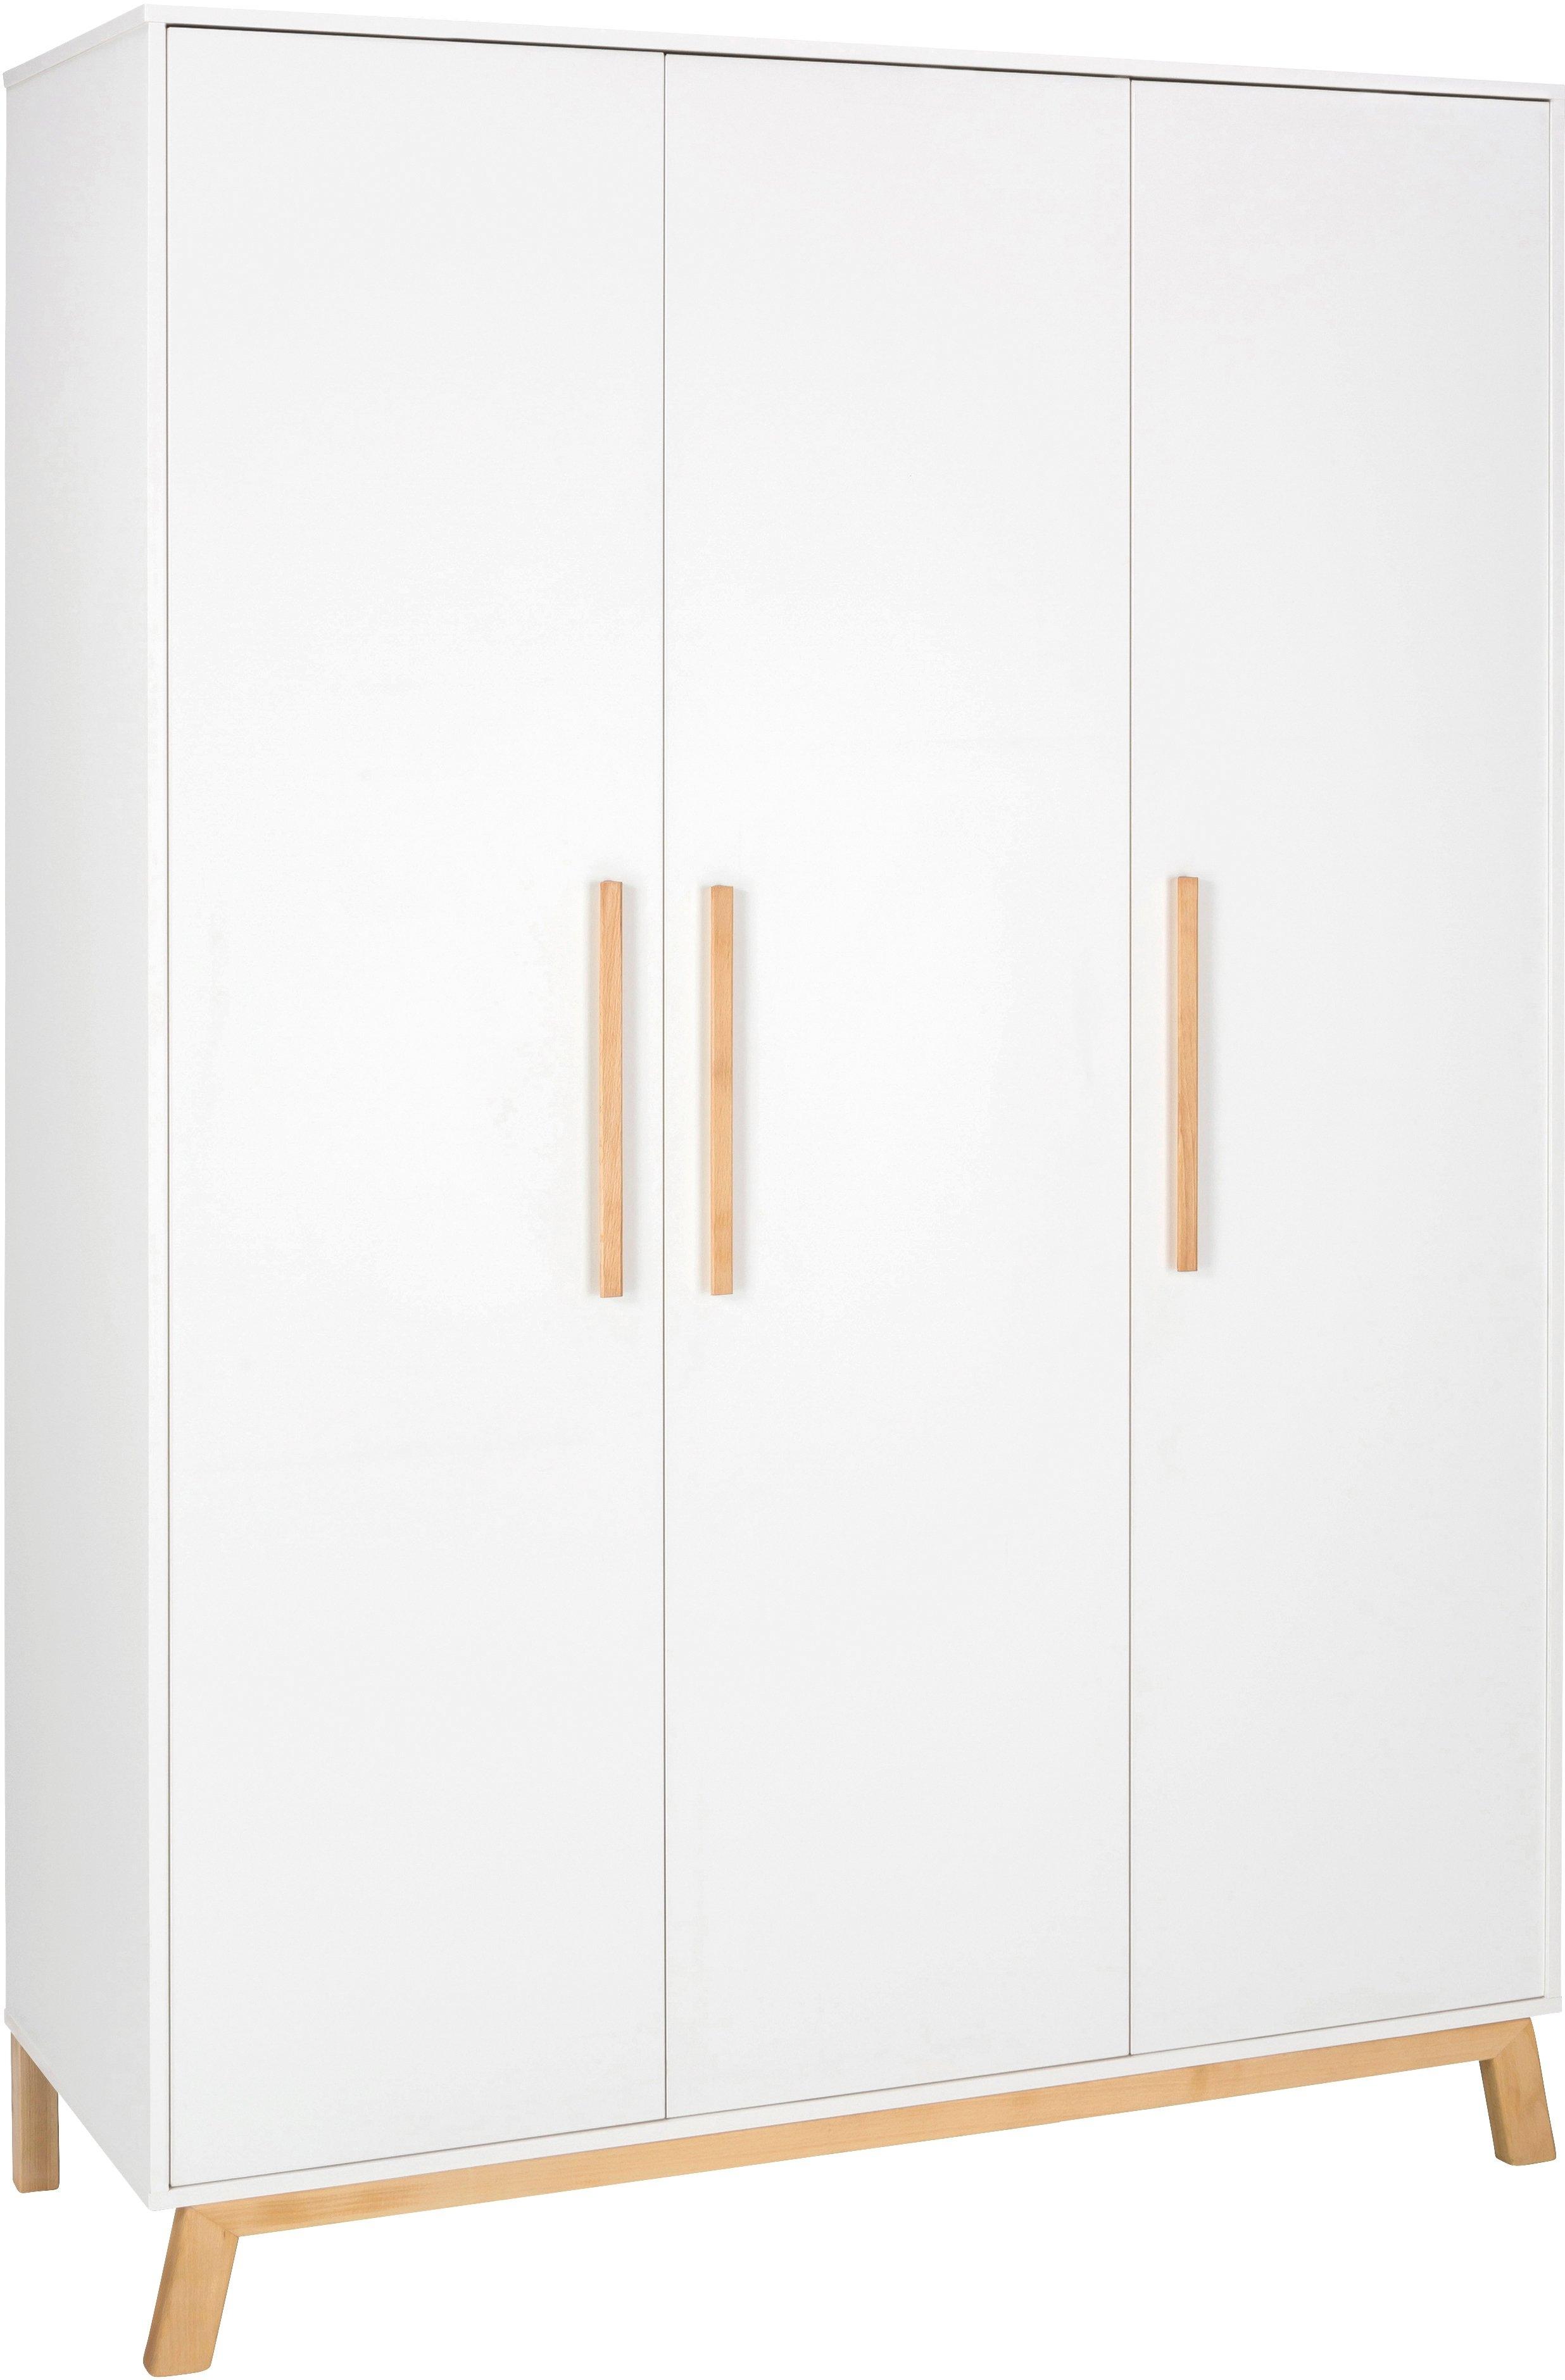 Schardt kledingkast Sienna White 3-deurs; made in germany nu online bestellen